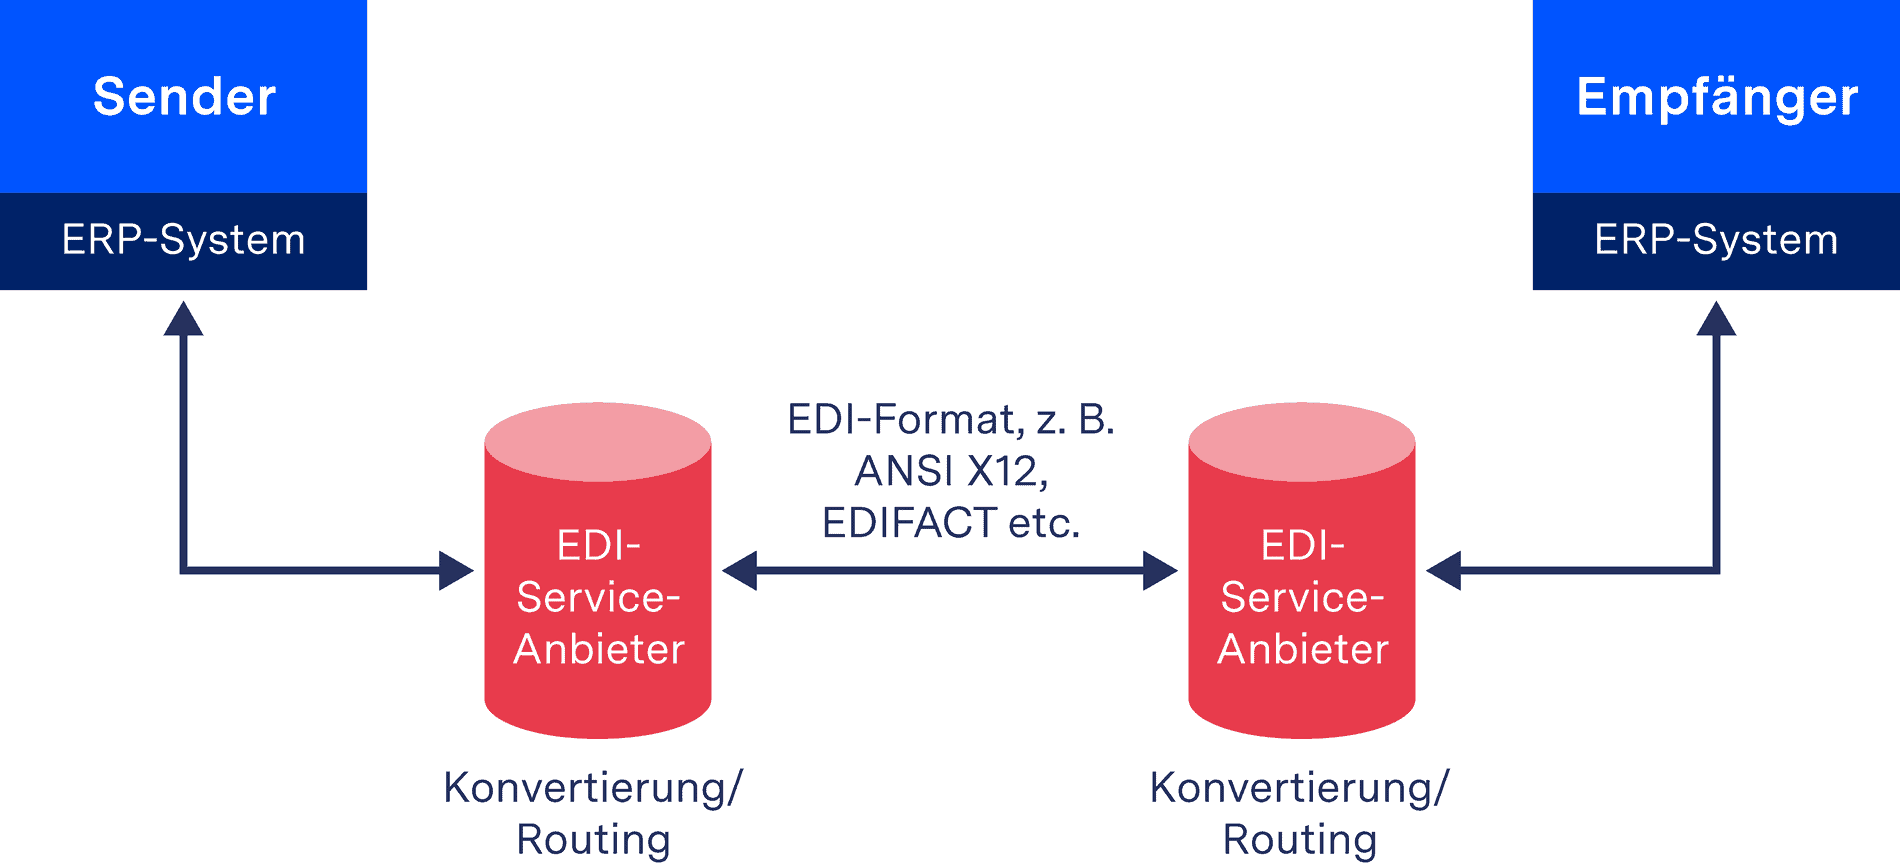 EDI via API - Cloud-basierte Lösung